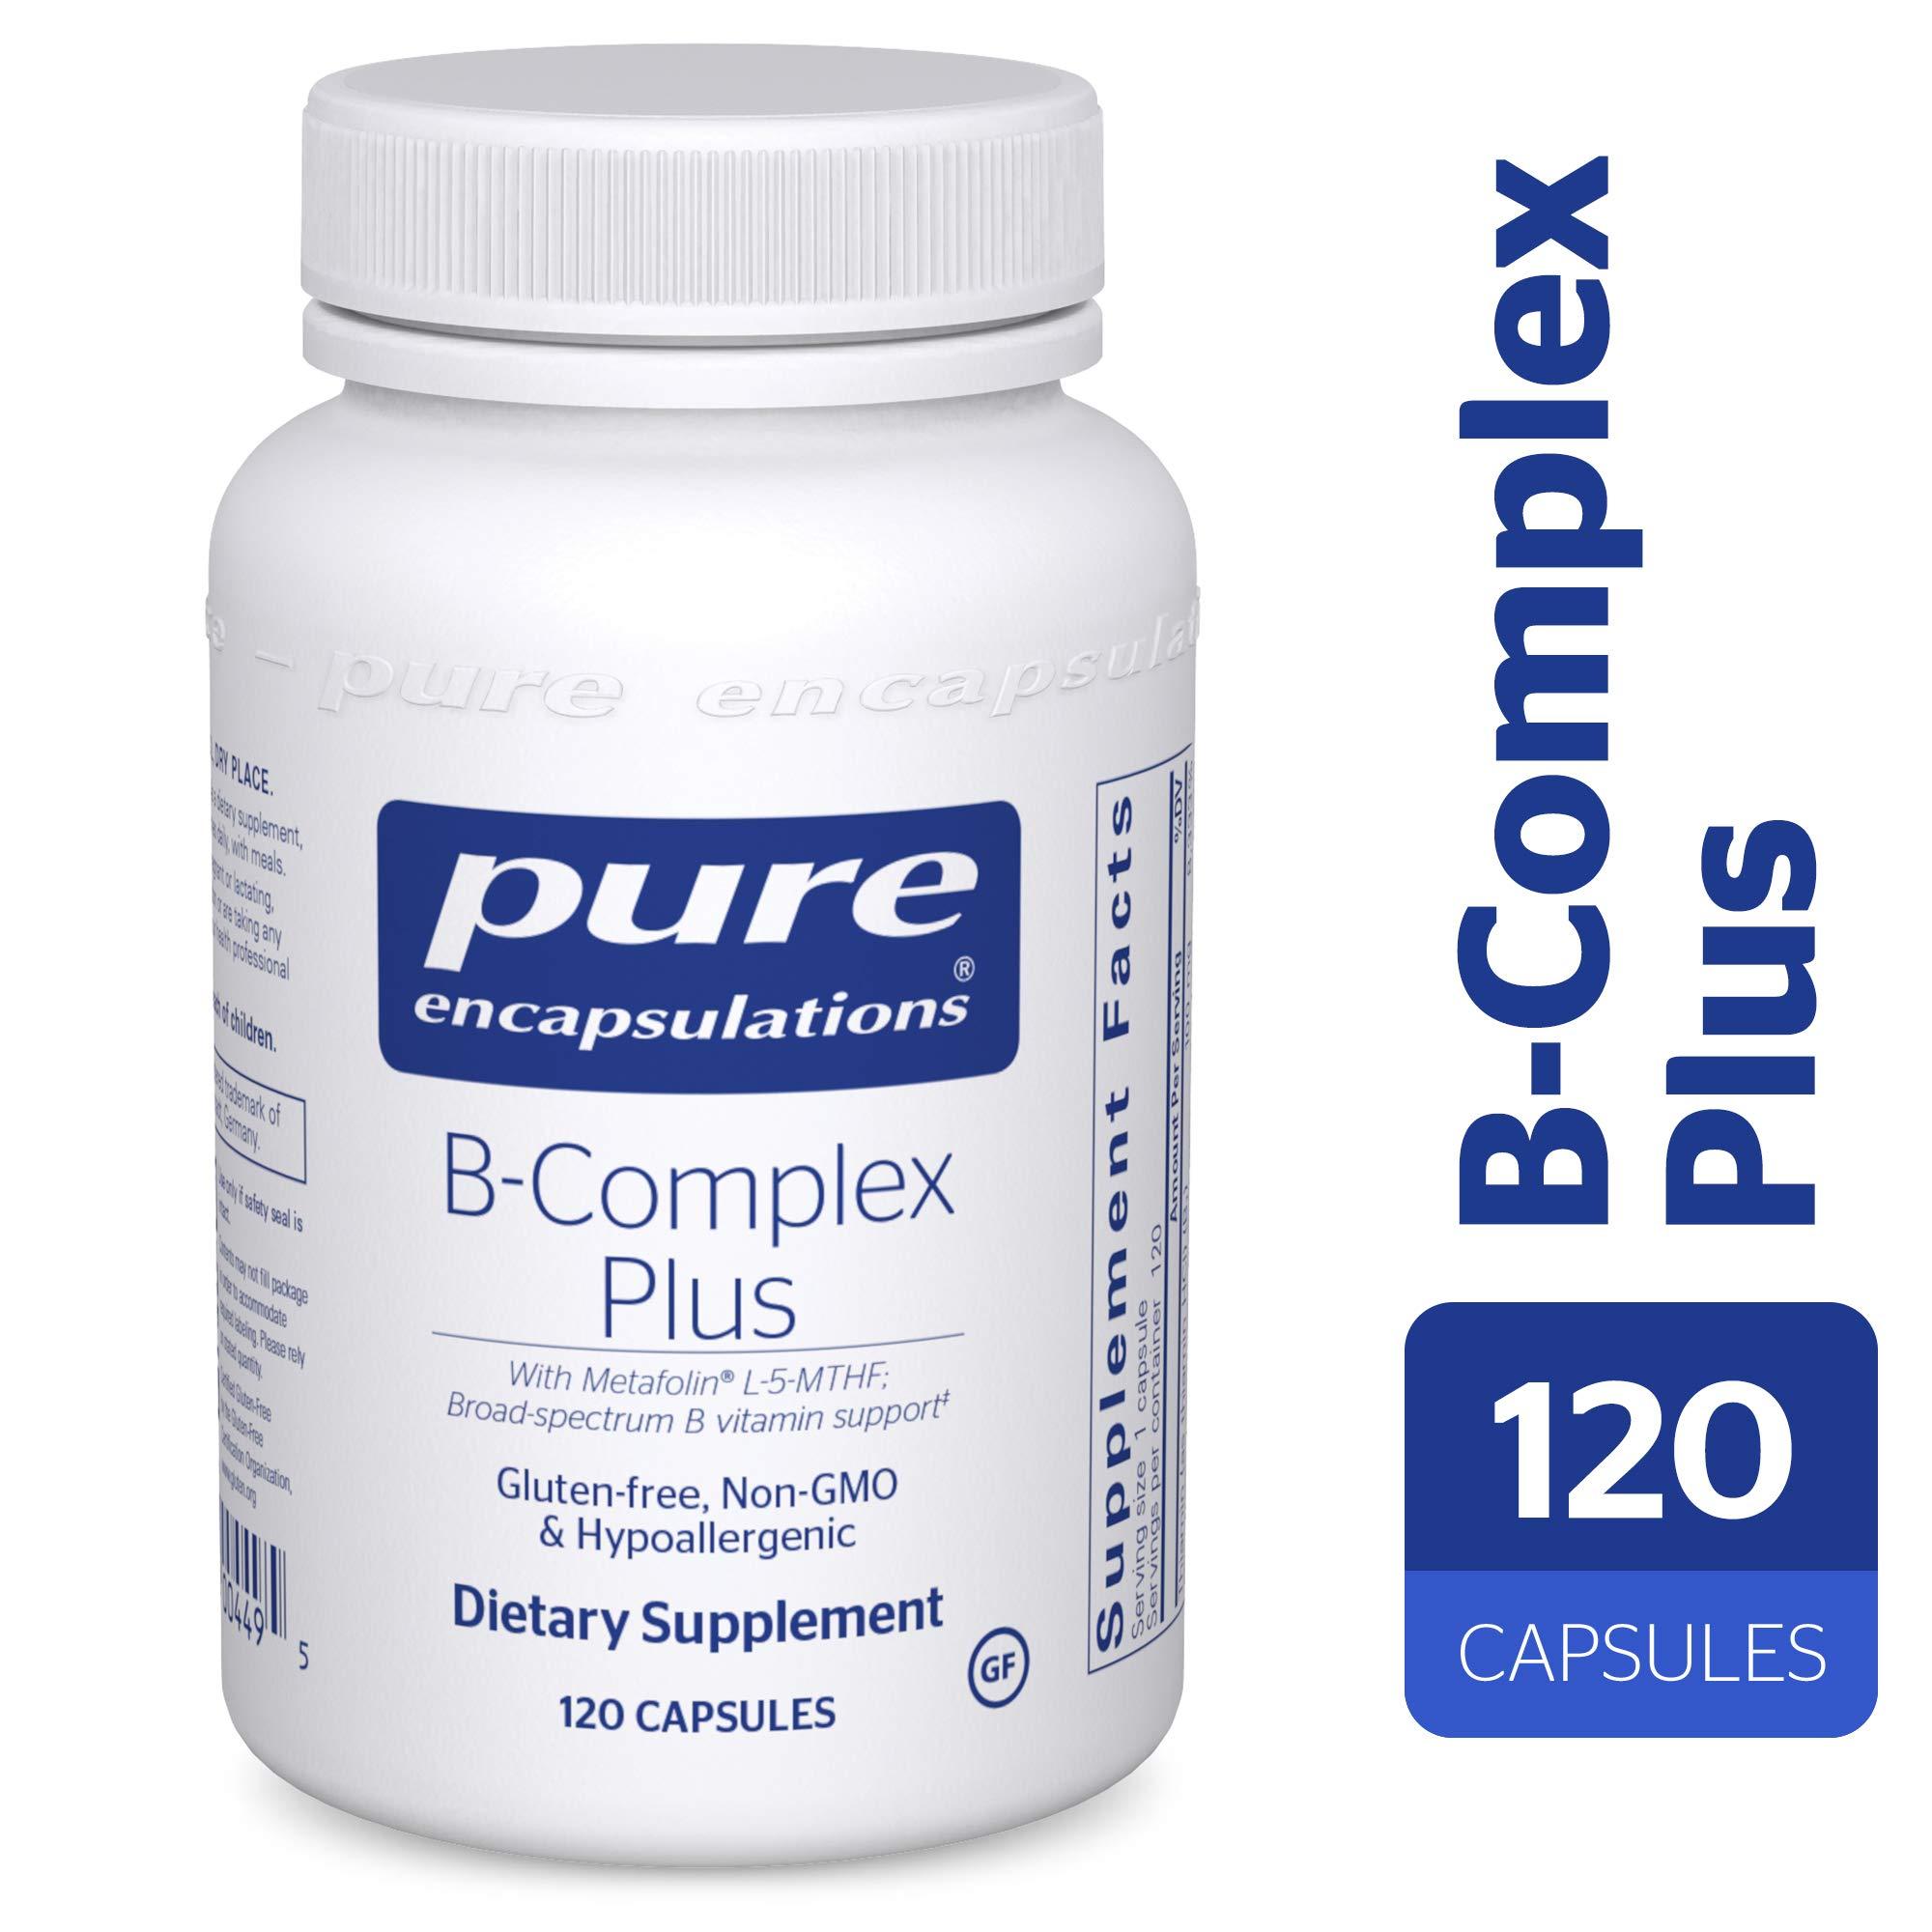 Pure Encapsulations - B-Complex Plus - Balanced B Vitamin Formula with Metafolin® L-5-MTHF and Vitamin B12 - 120 Capsules